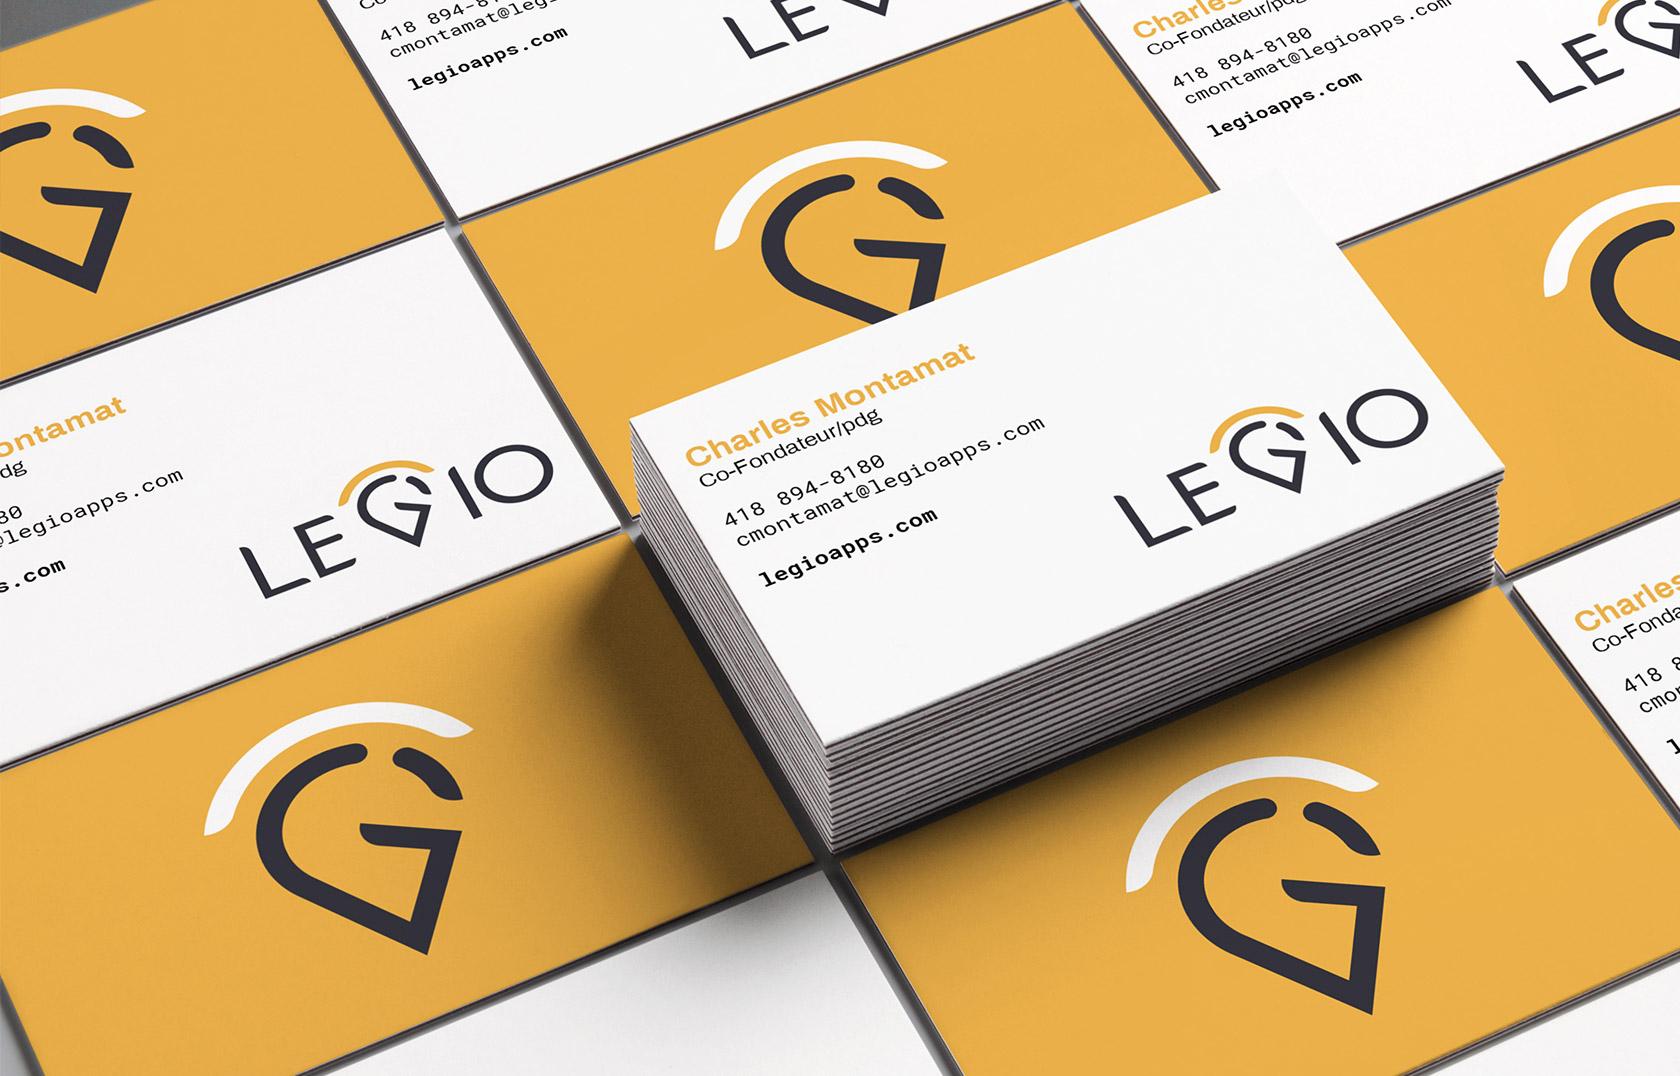 Portfolio-Agence-Phosphore-Logo-Legio_03